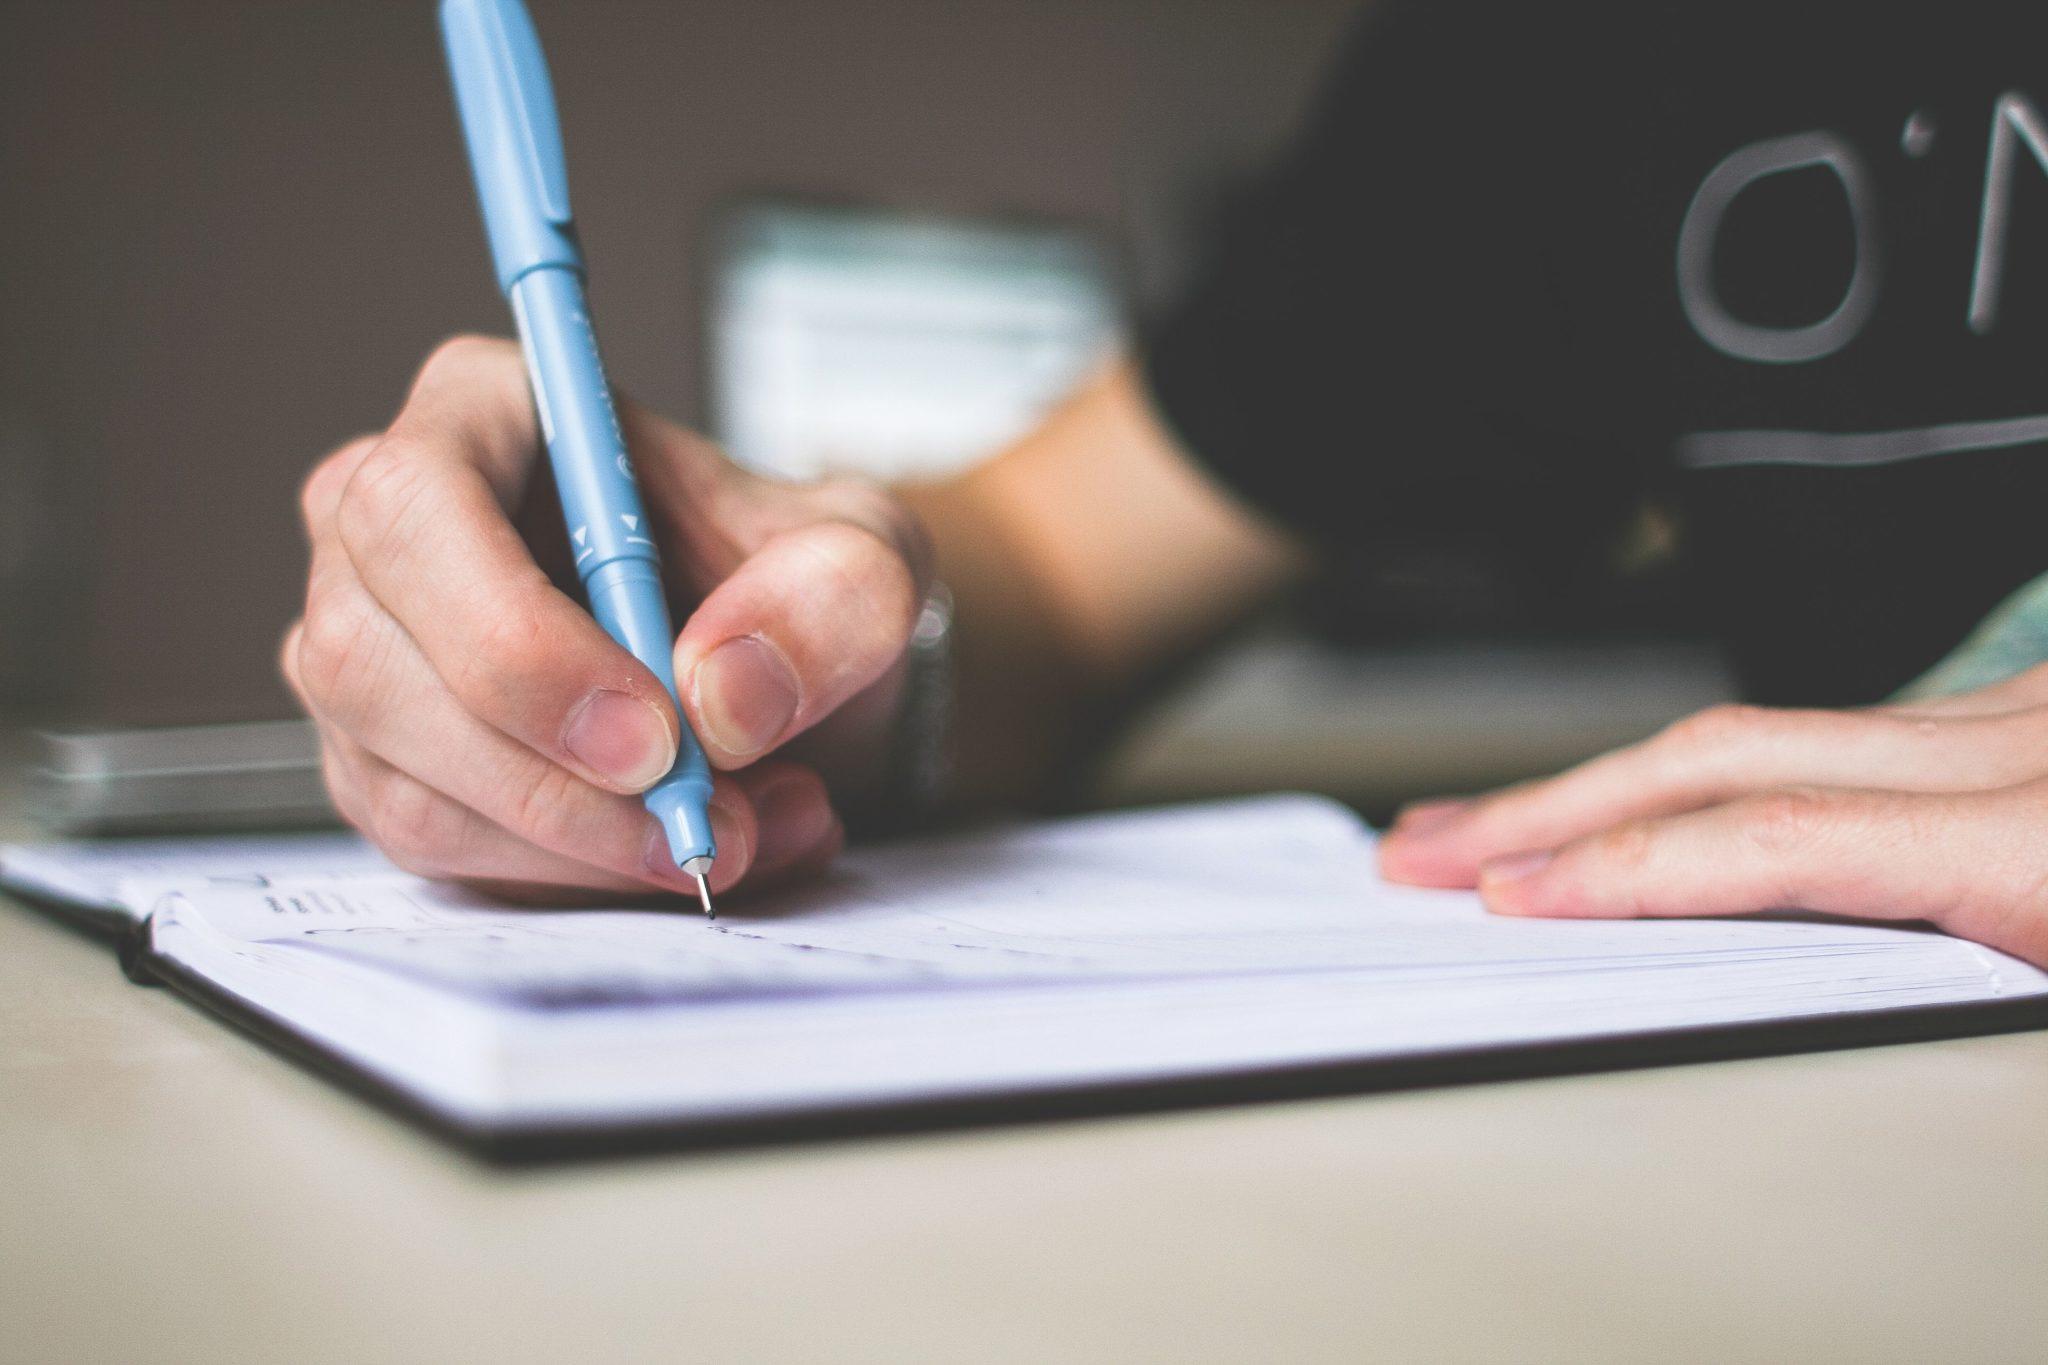 Curriculum Vitae : Format Mistakes to Avoid